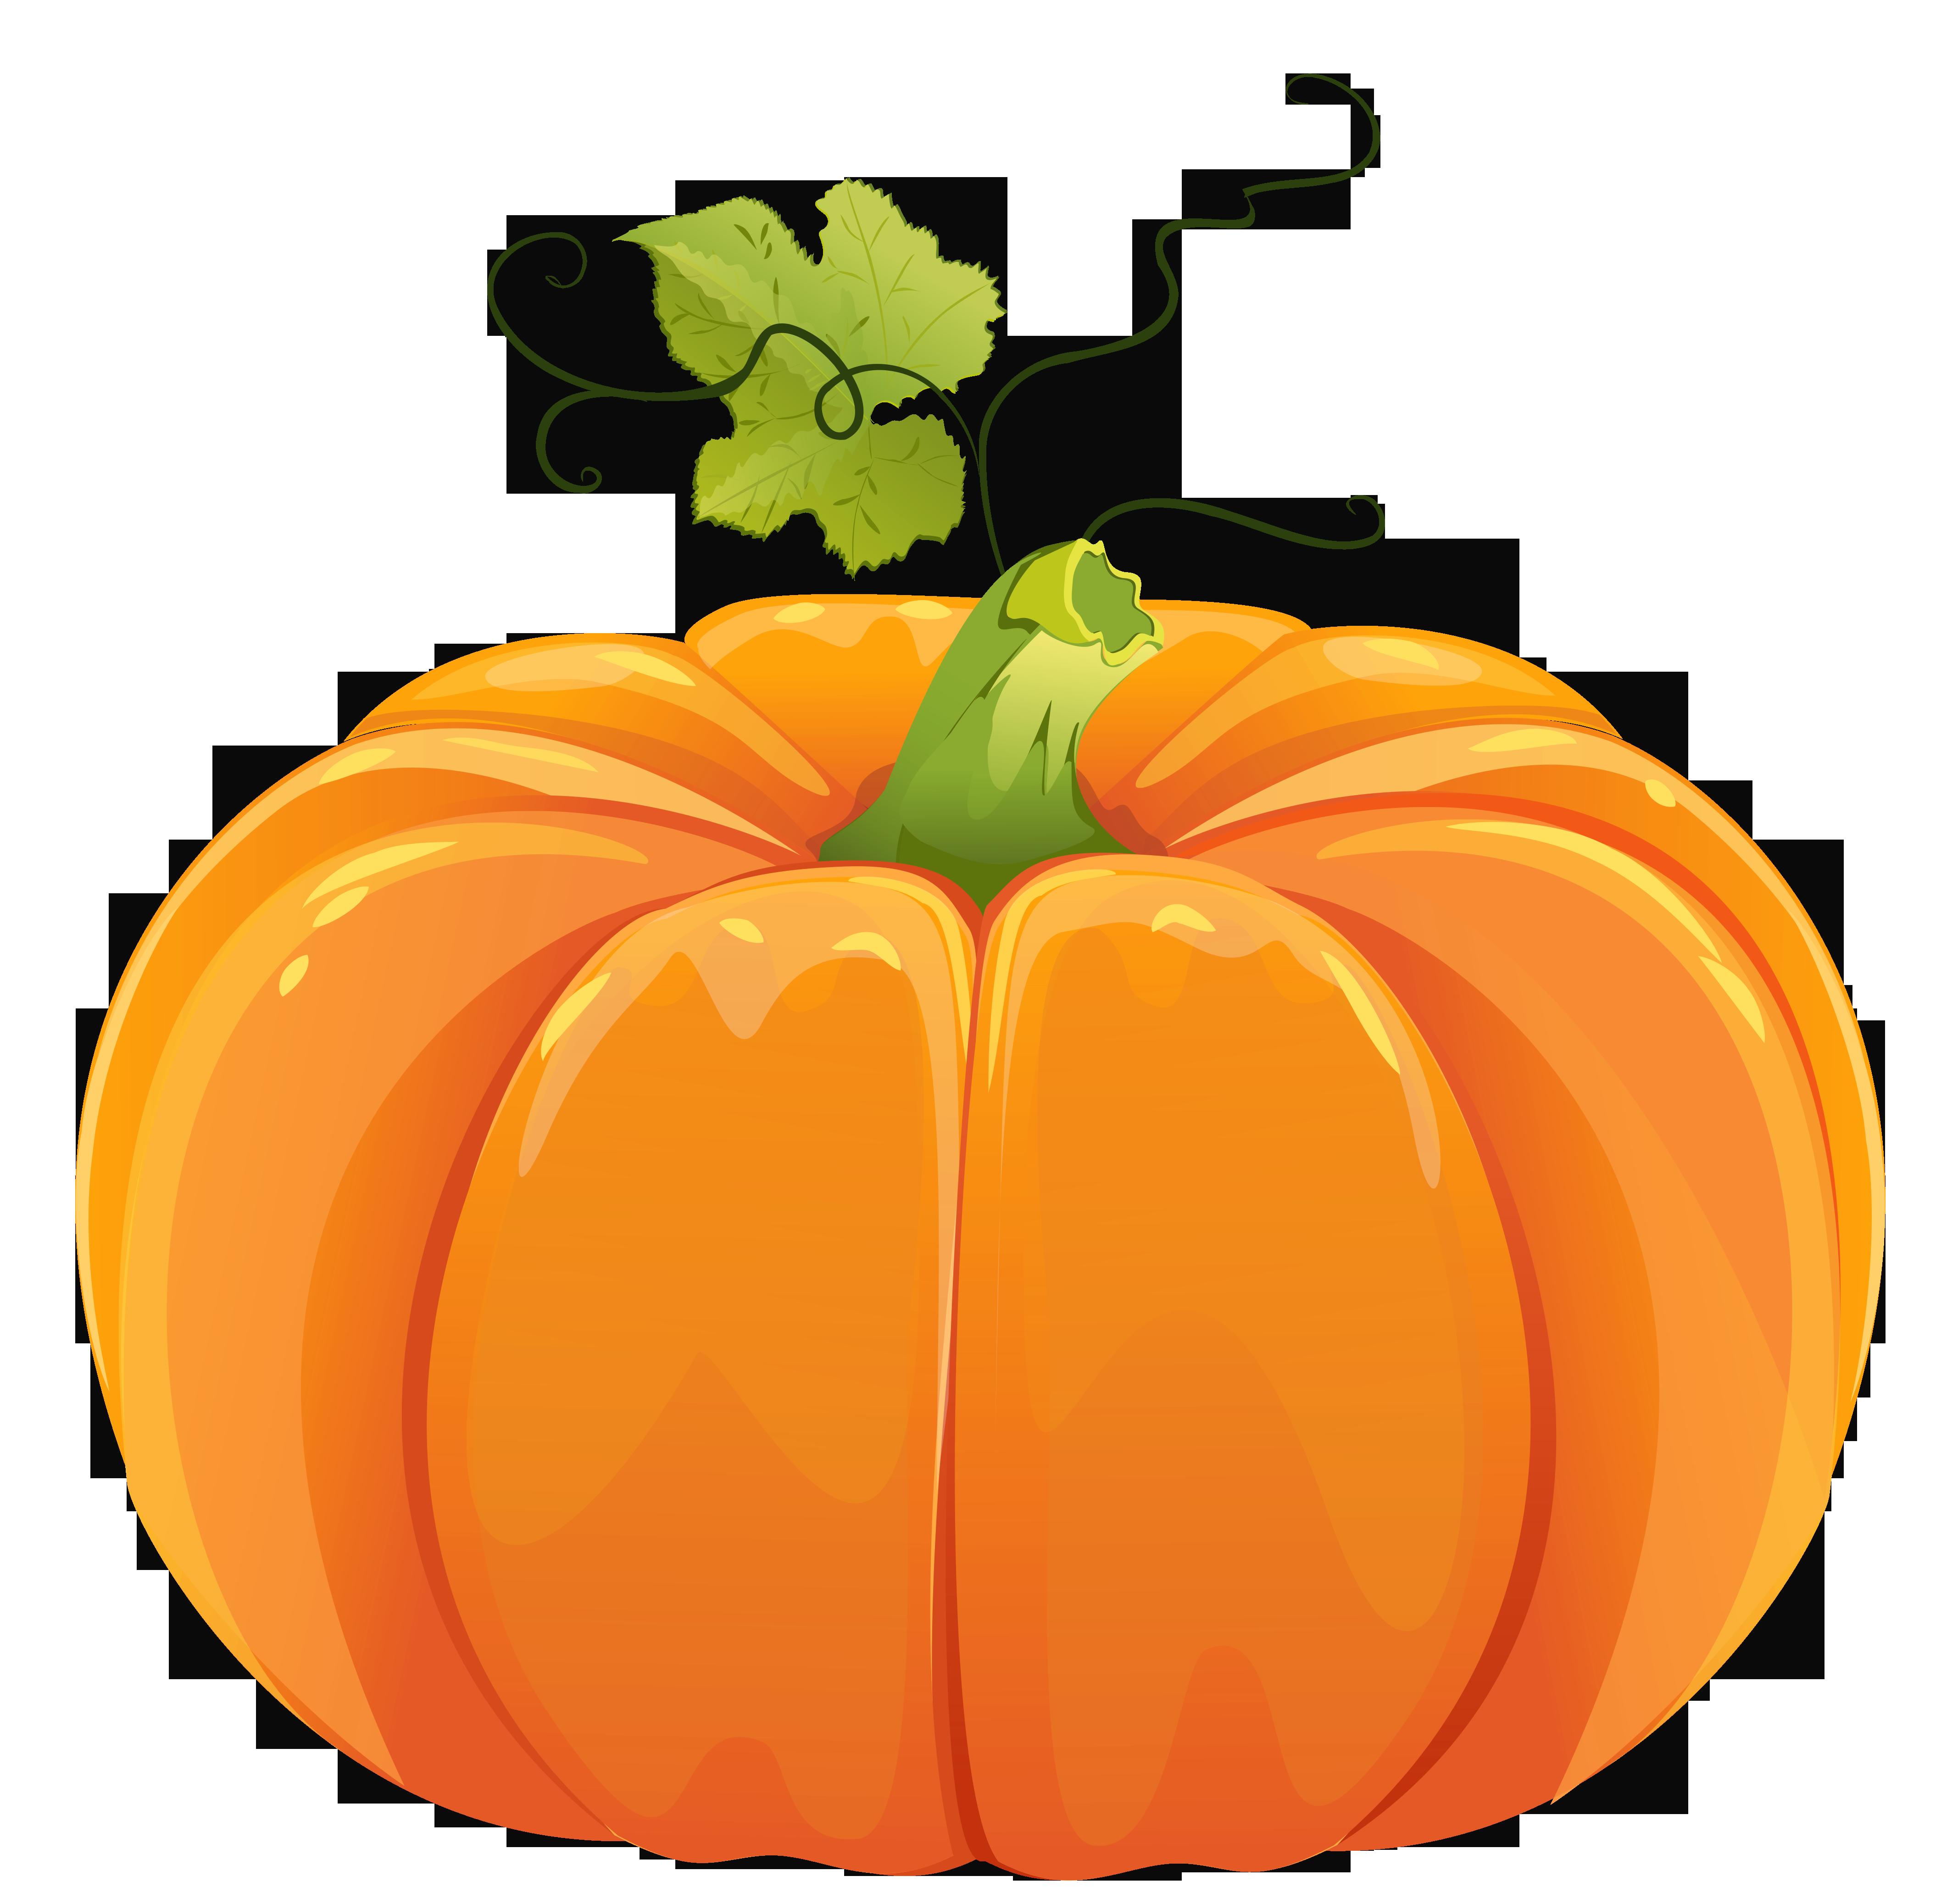 Abobora clipart picture freeuse download Pumpkin Pictures Clip Art – Halloween Arts | Artes da dDita ... picture freeuse download